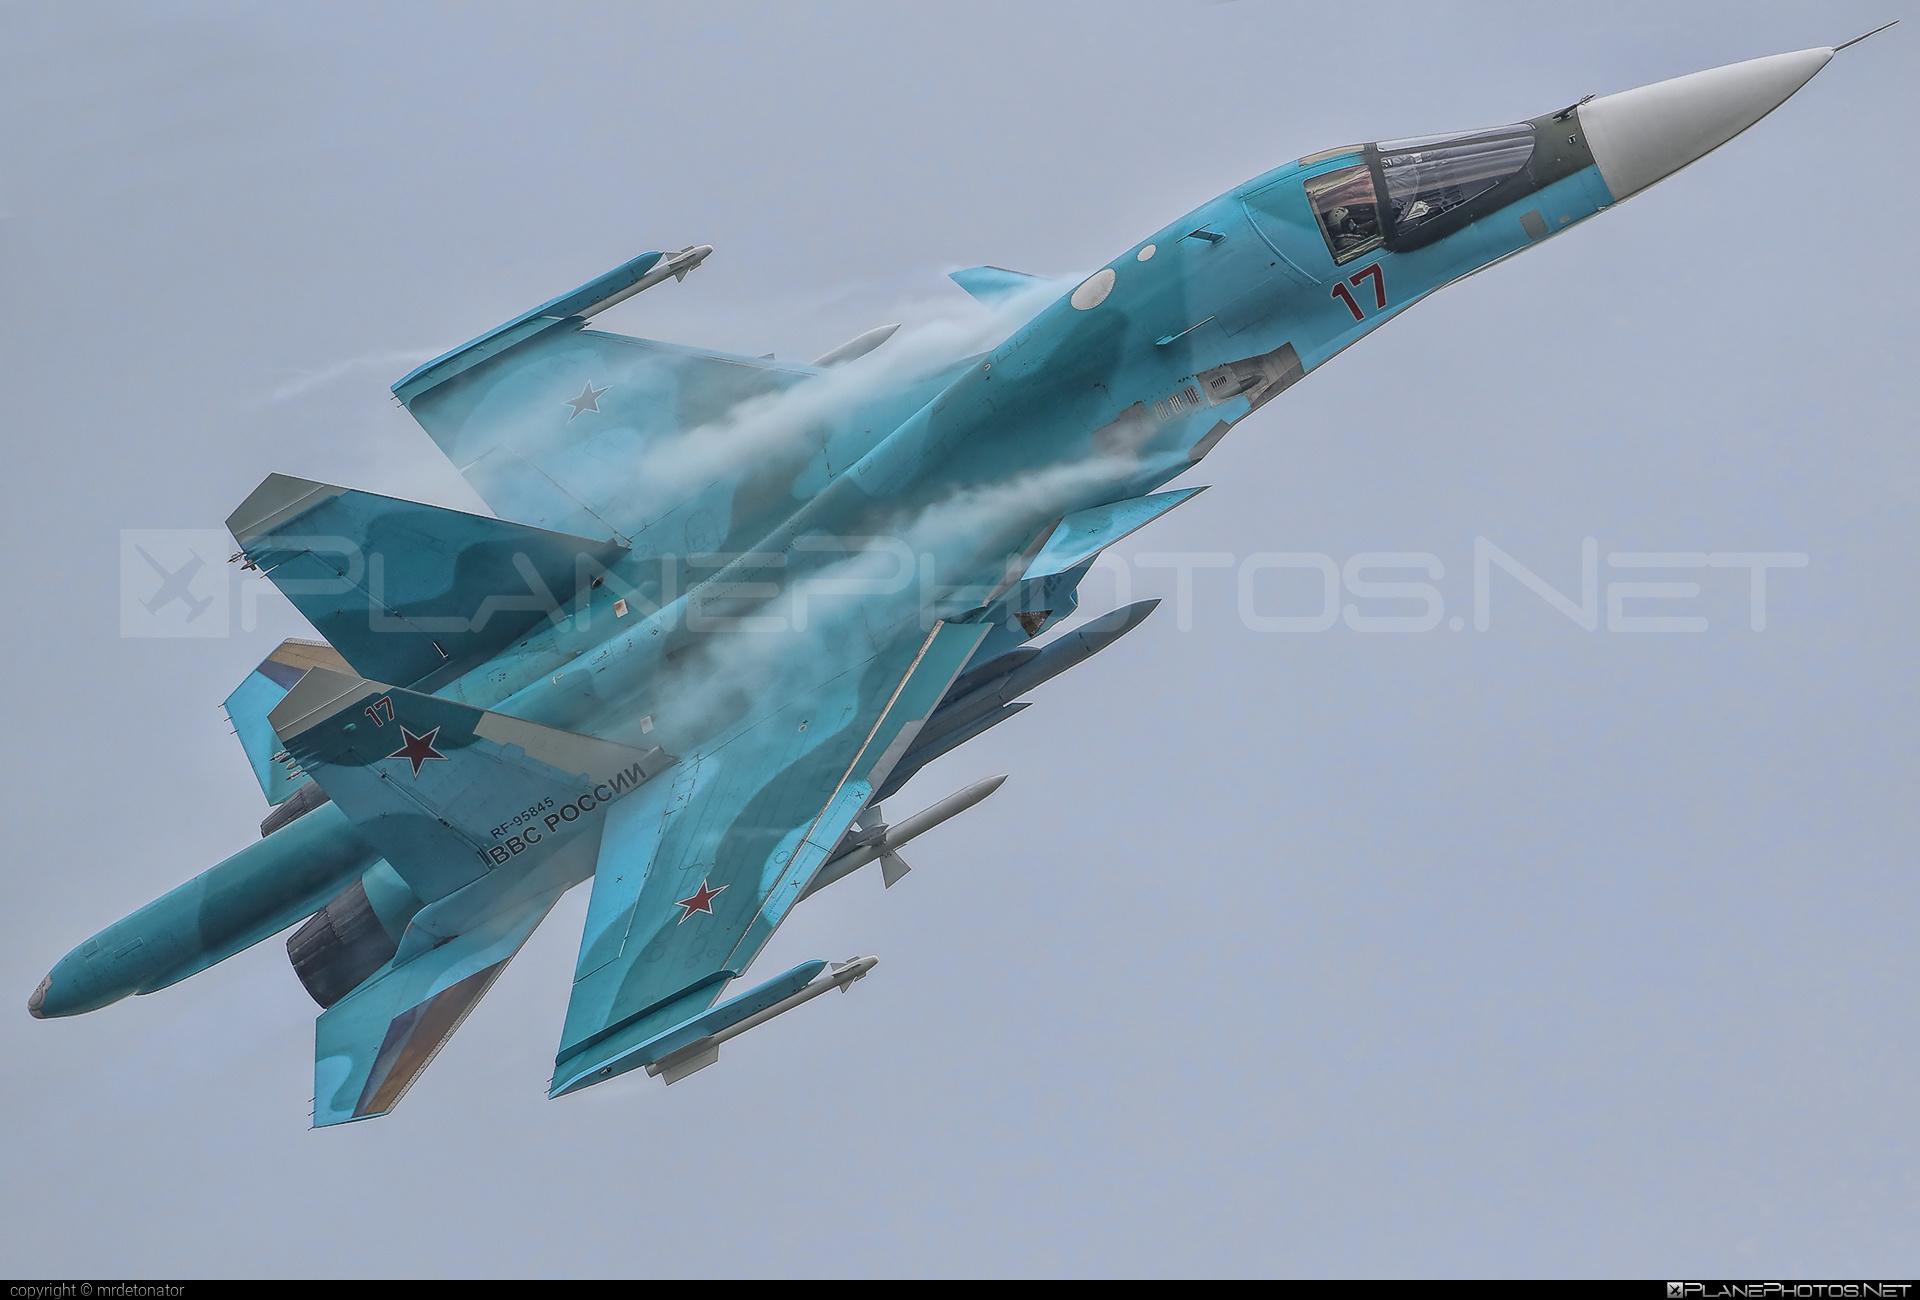 Sukhoi Su-34 - RF-95845 operated by Voyenno-vozdushnye sily Rossii (Russian Air Force) #sukhoi